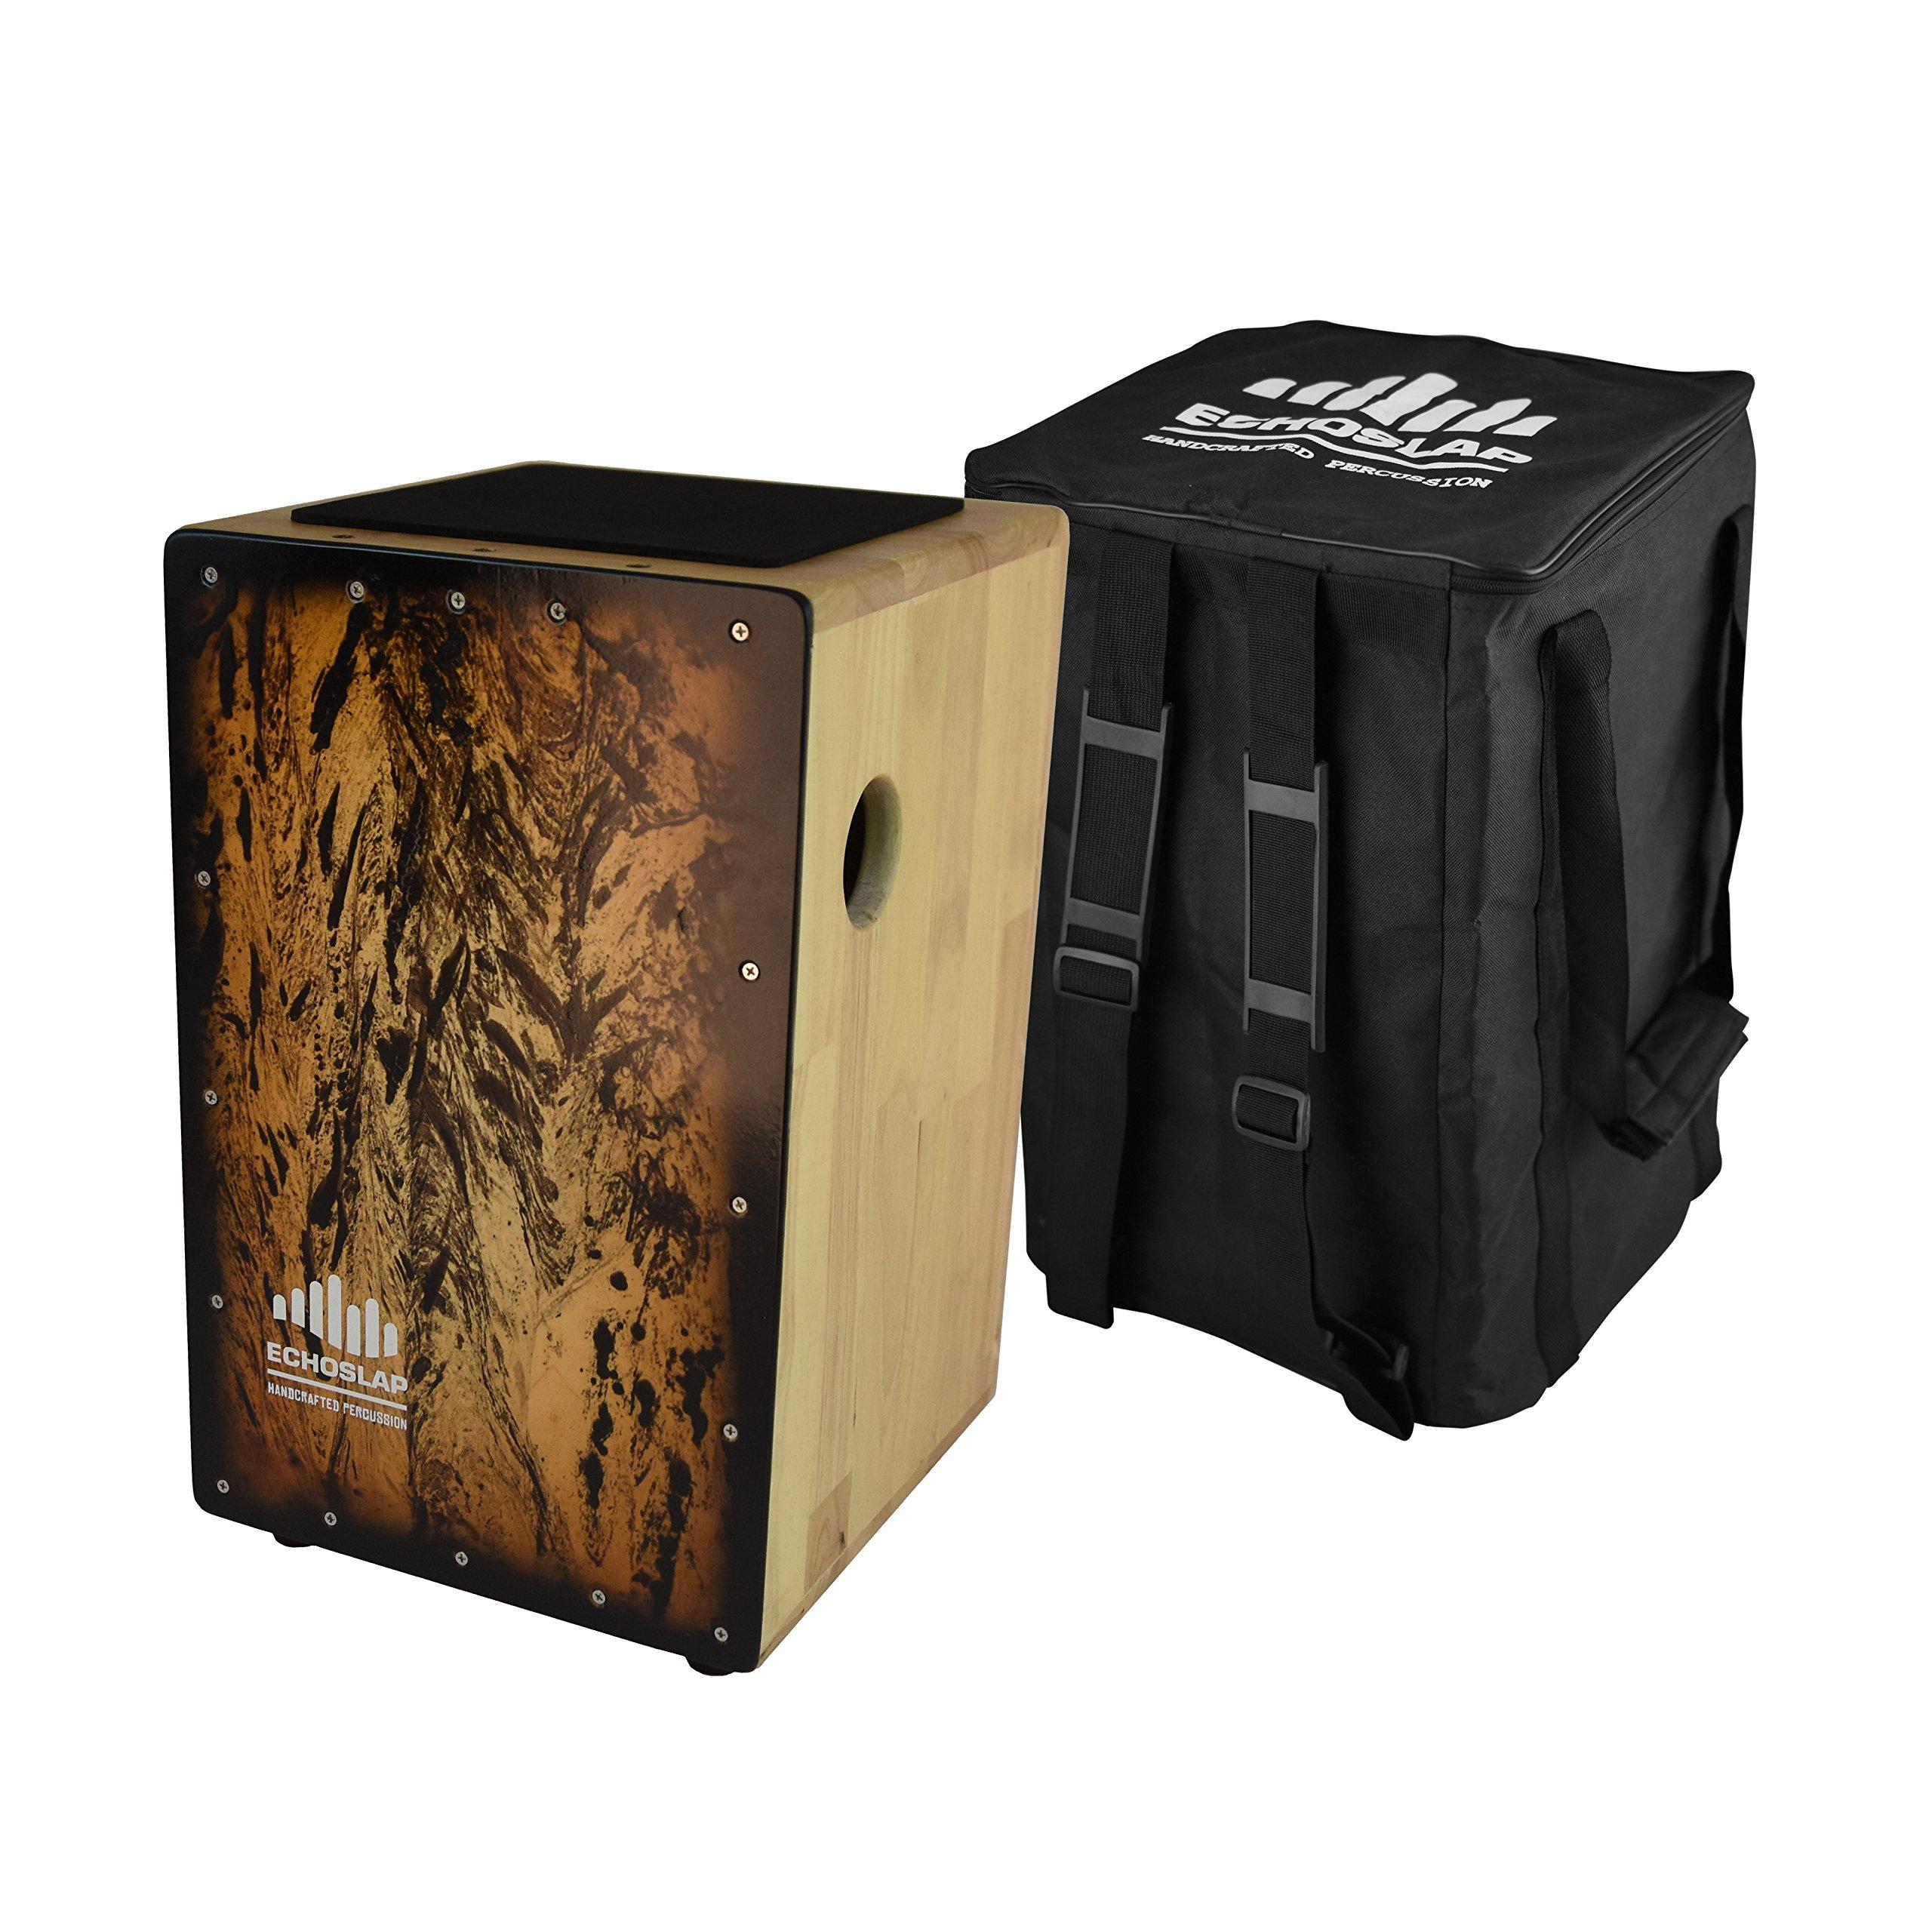 Echoslap Solid Siam Oak Bass Cajon -Smoke Frontplate, Deep Bass Tones, 3 Snare Wires for Crisp Buzz